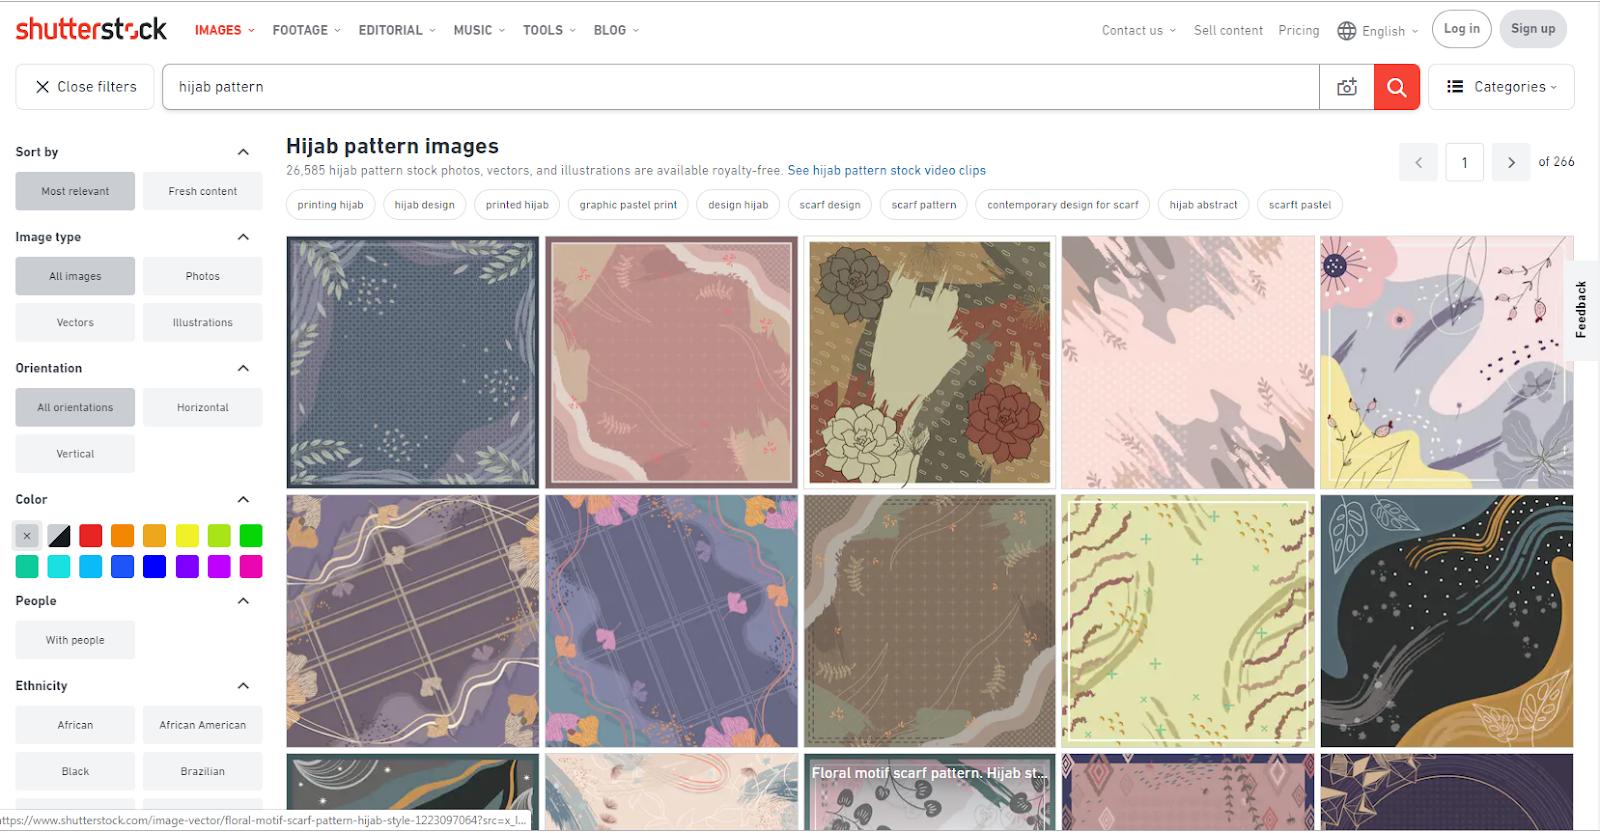 Mudahnya Download Desain Scarf Hijab di Shutterstock - My Life on